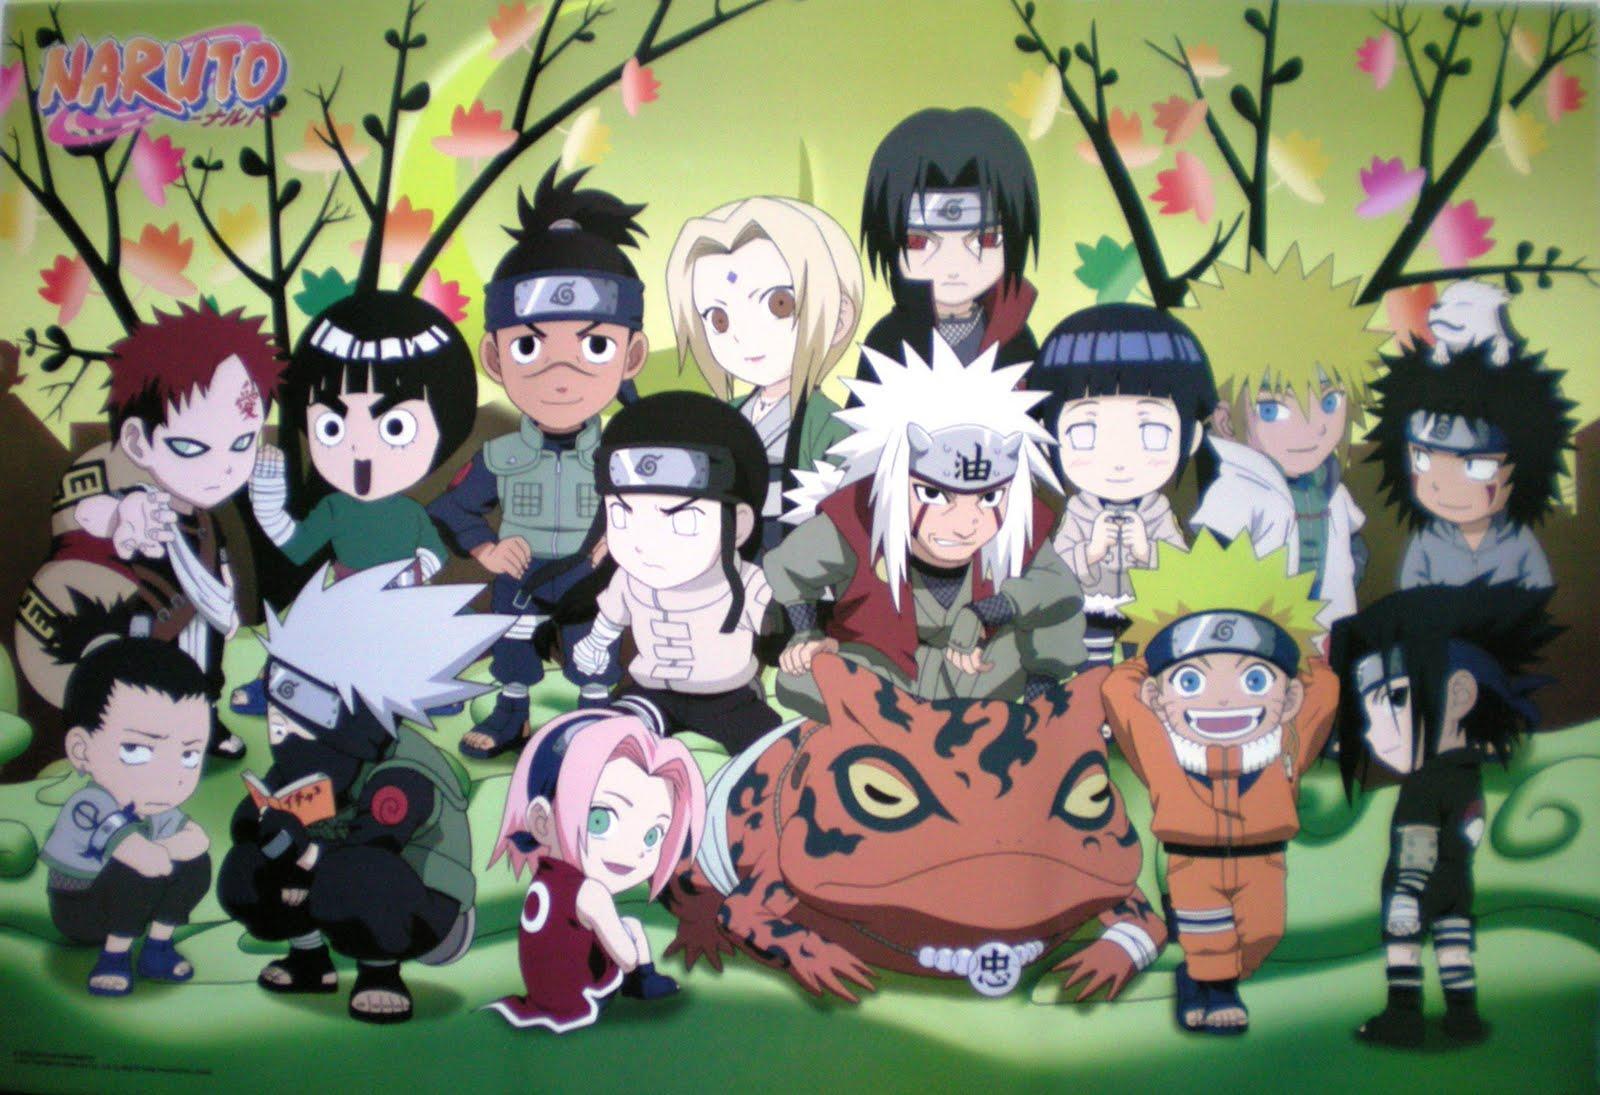 Naruto Shipuden Chibi Group Wallpaper 1600x1095